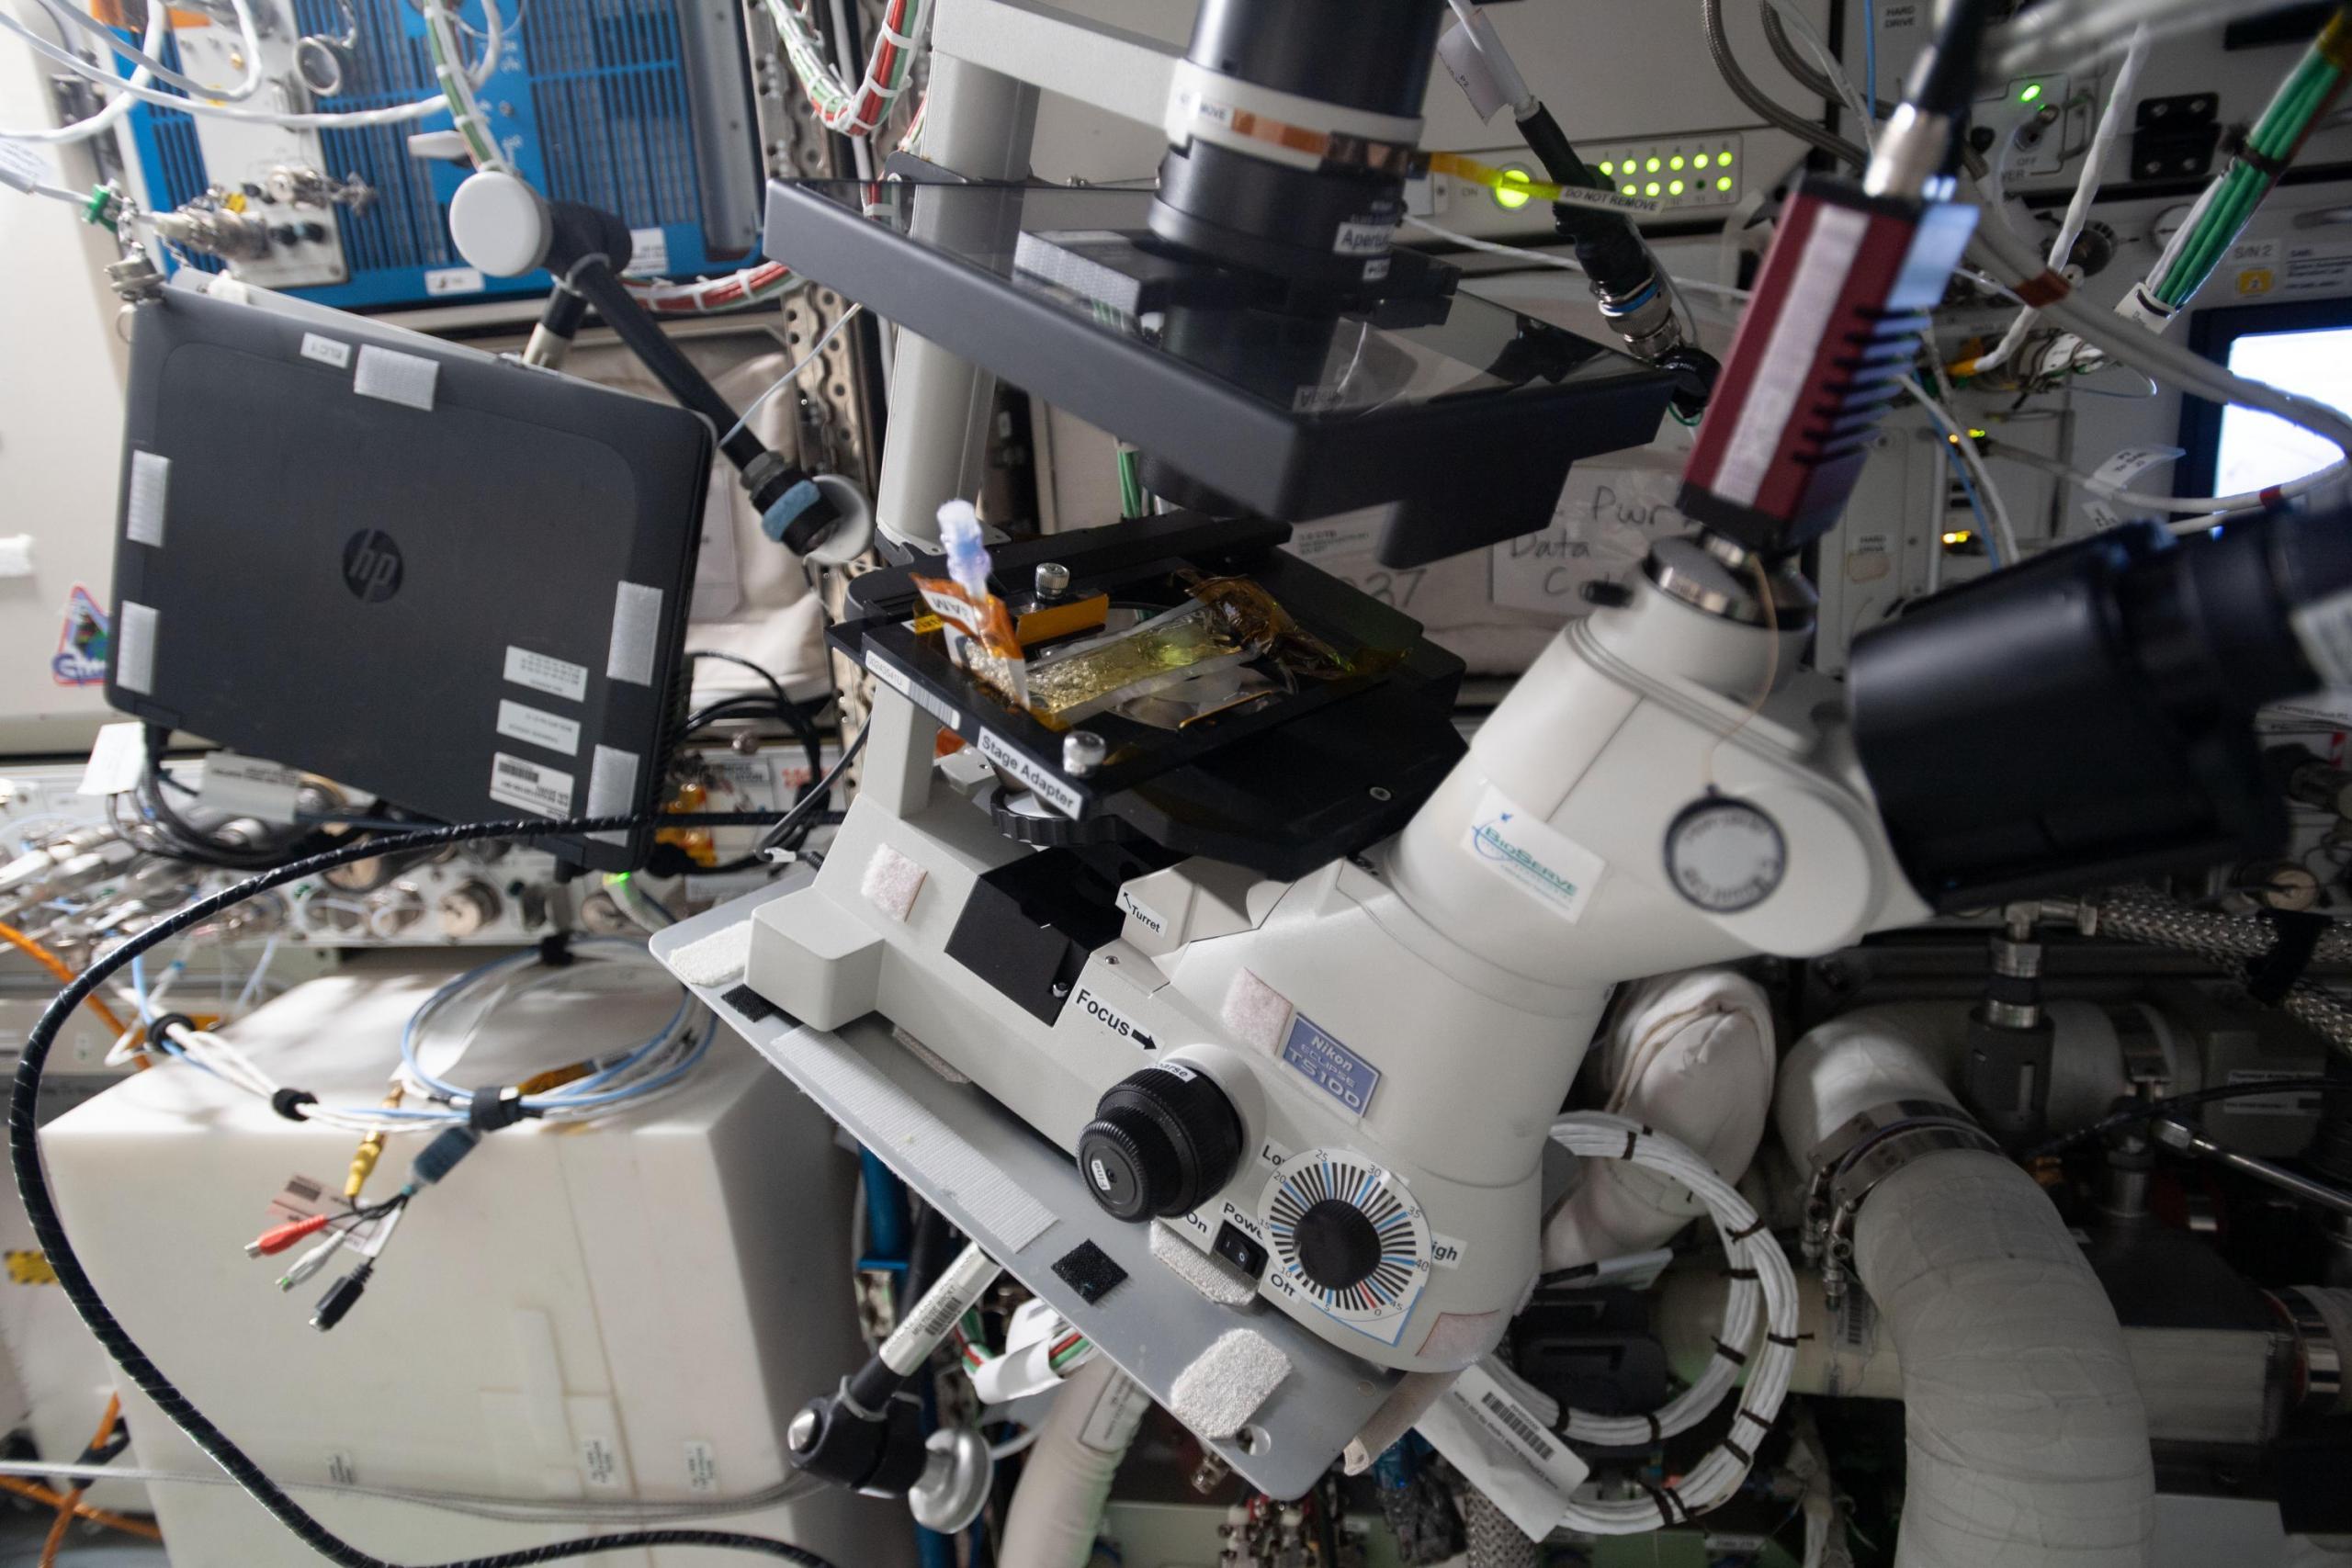 imagen del hardware del experimento